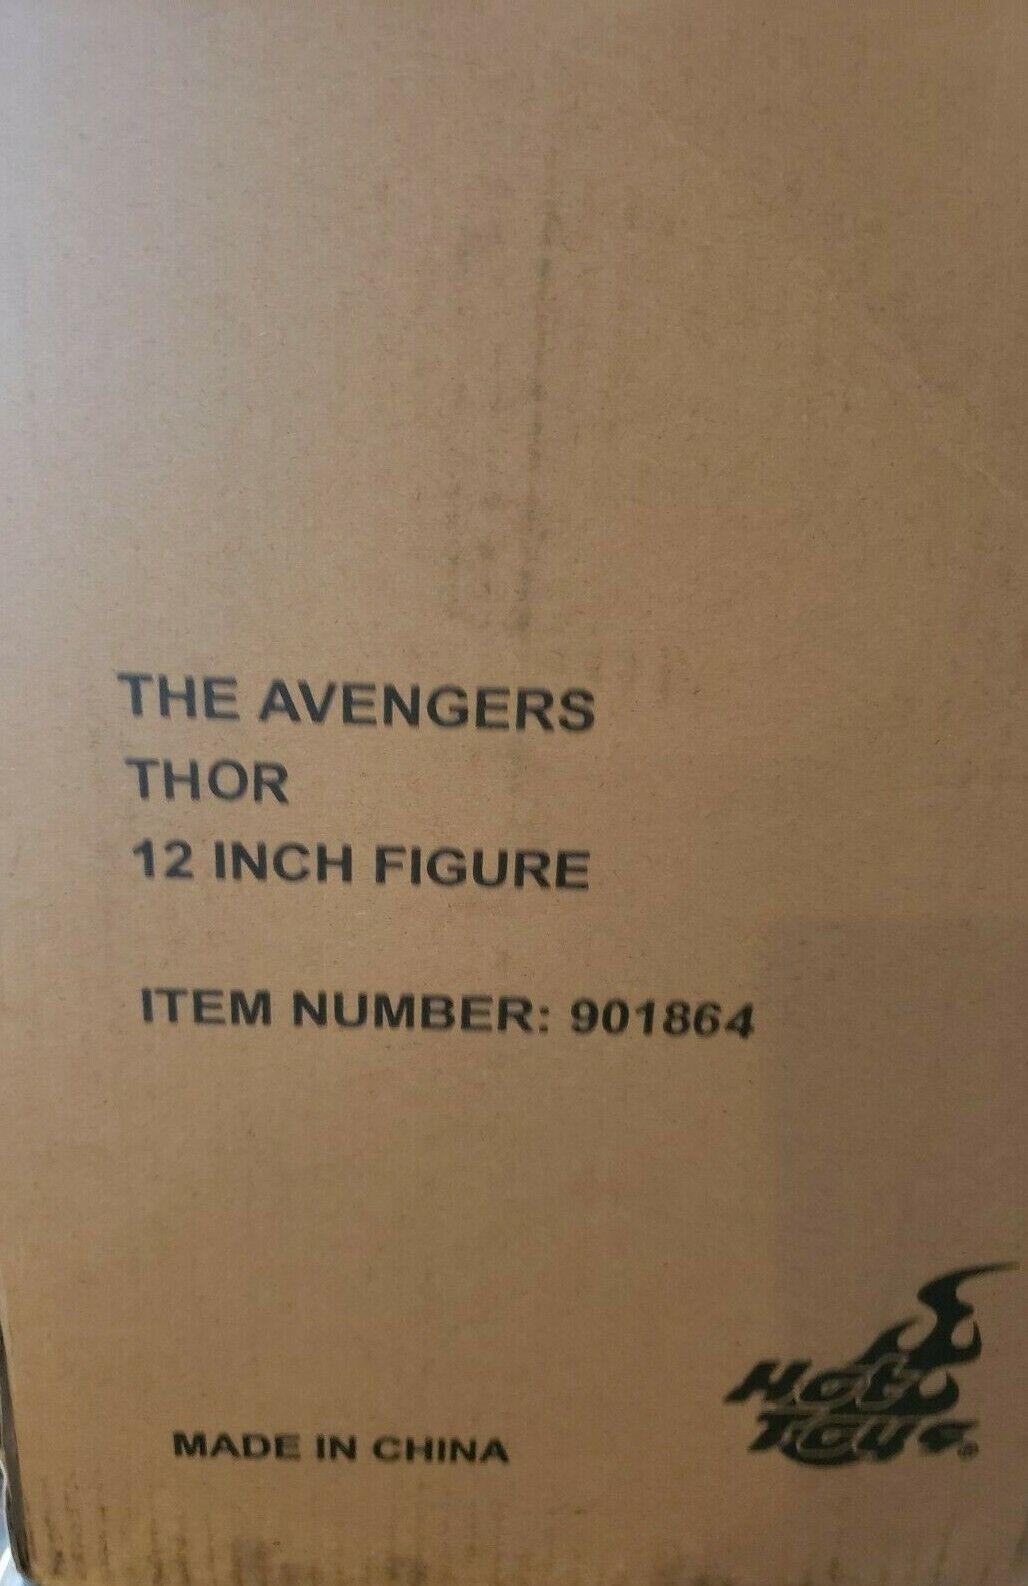 Hot Toys Thor Action Figure on eBay thumbnail